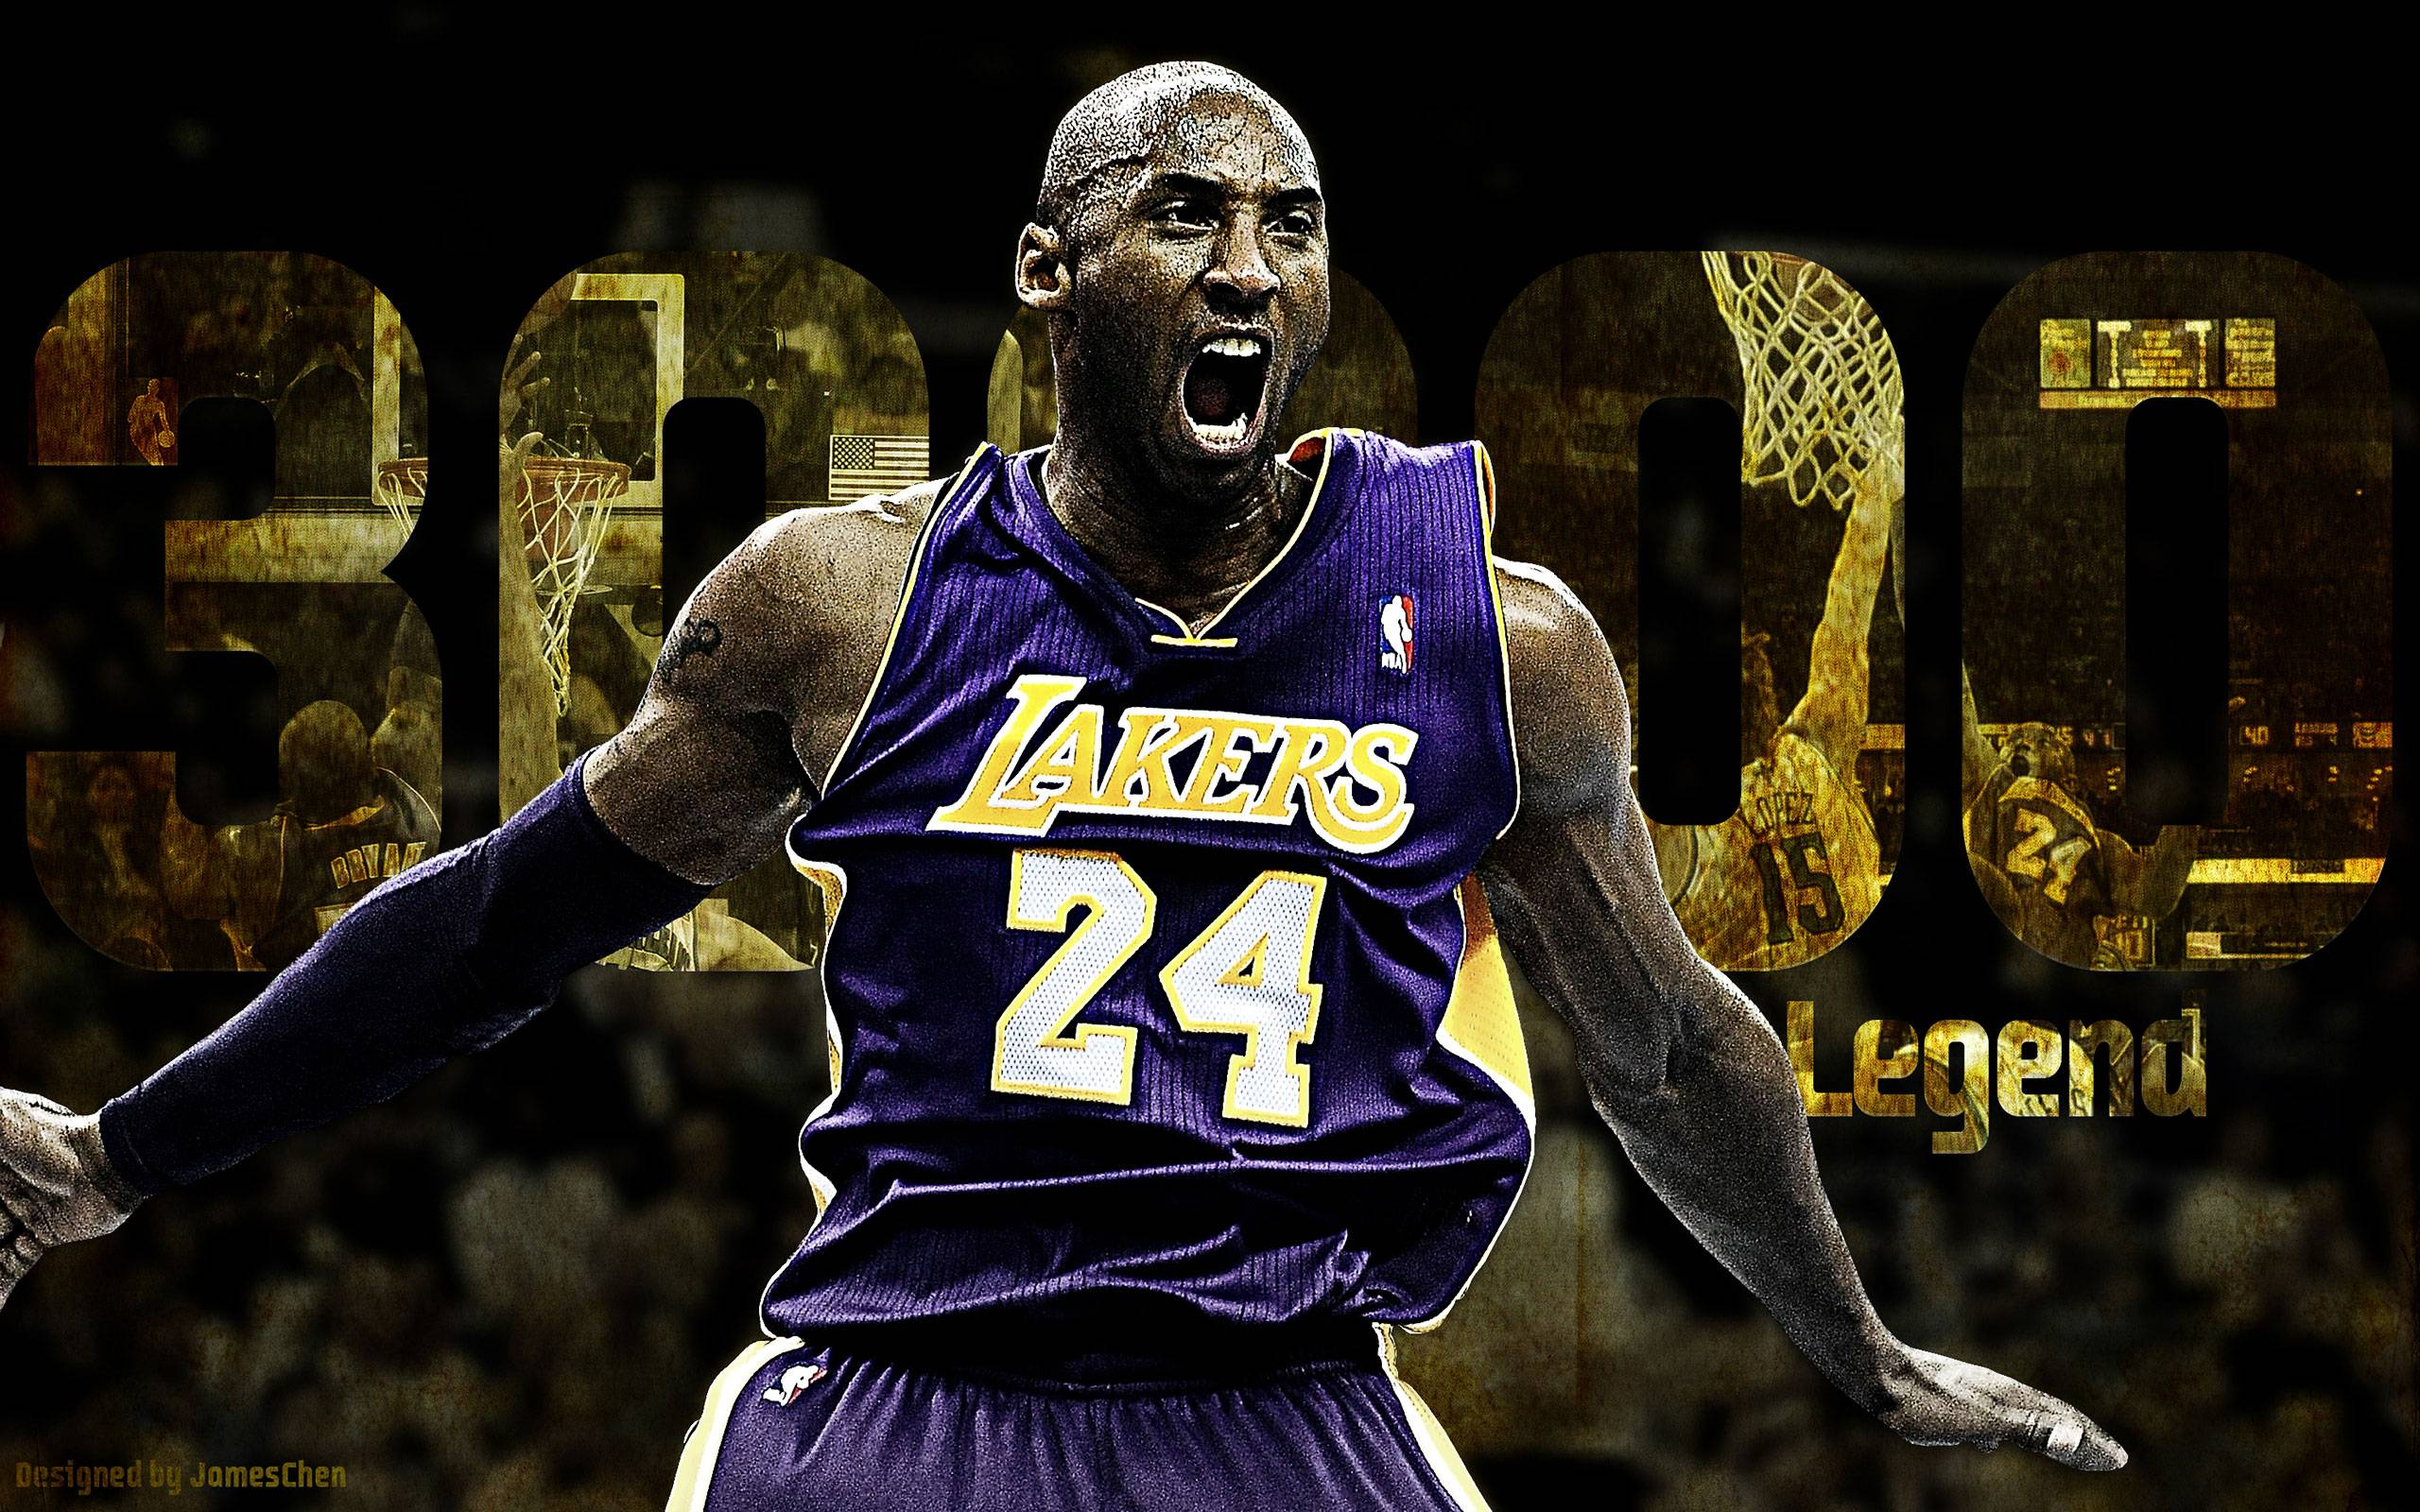 Nba Kobe Bryant Wallpapers Top Free Nba Kobe Bryant Backgrounds Wallpaperaccess